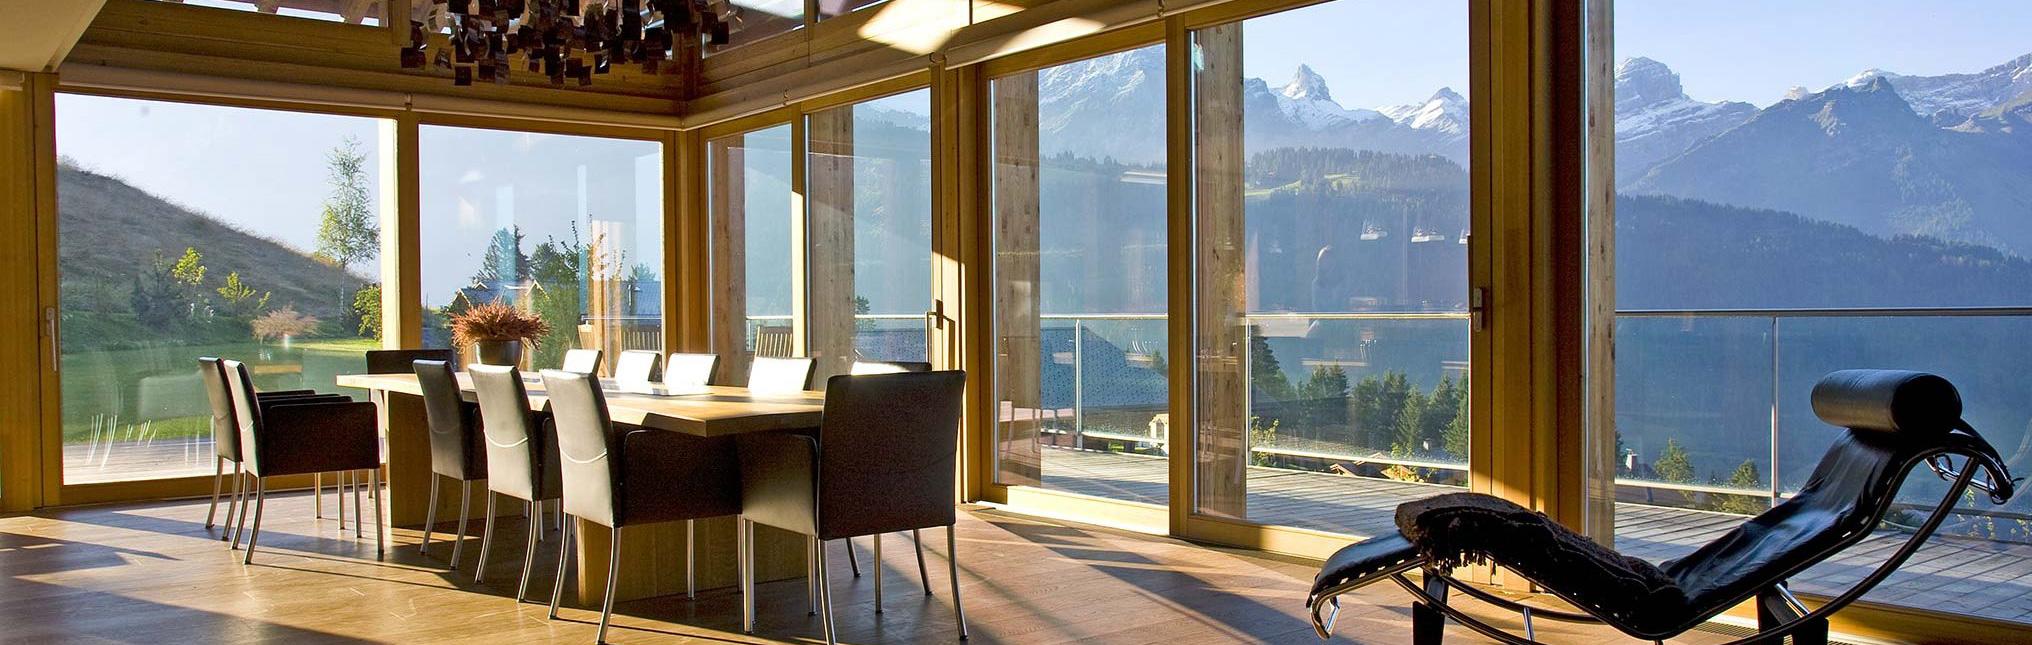 luxury interior renovation